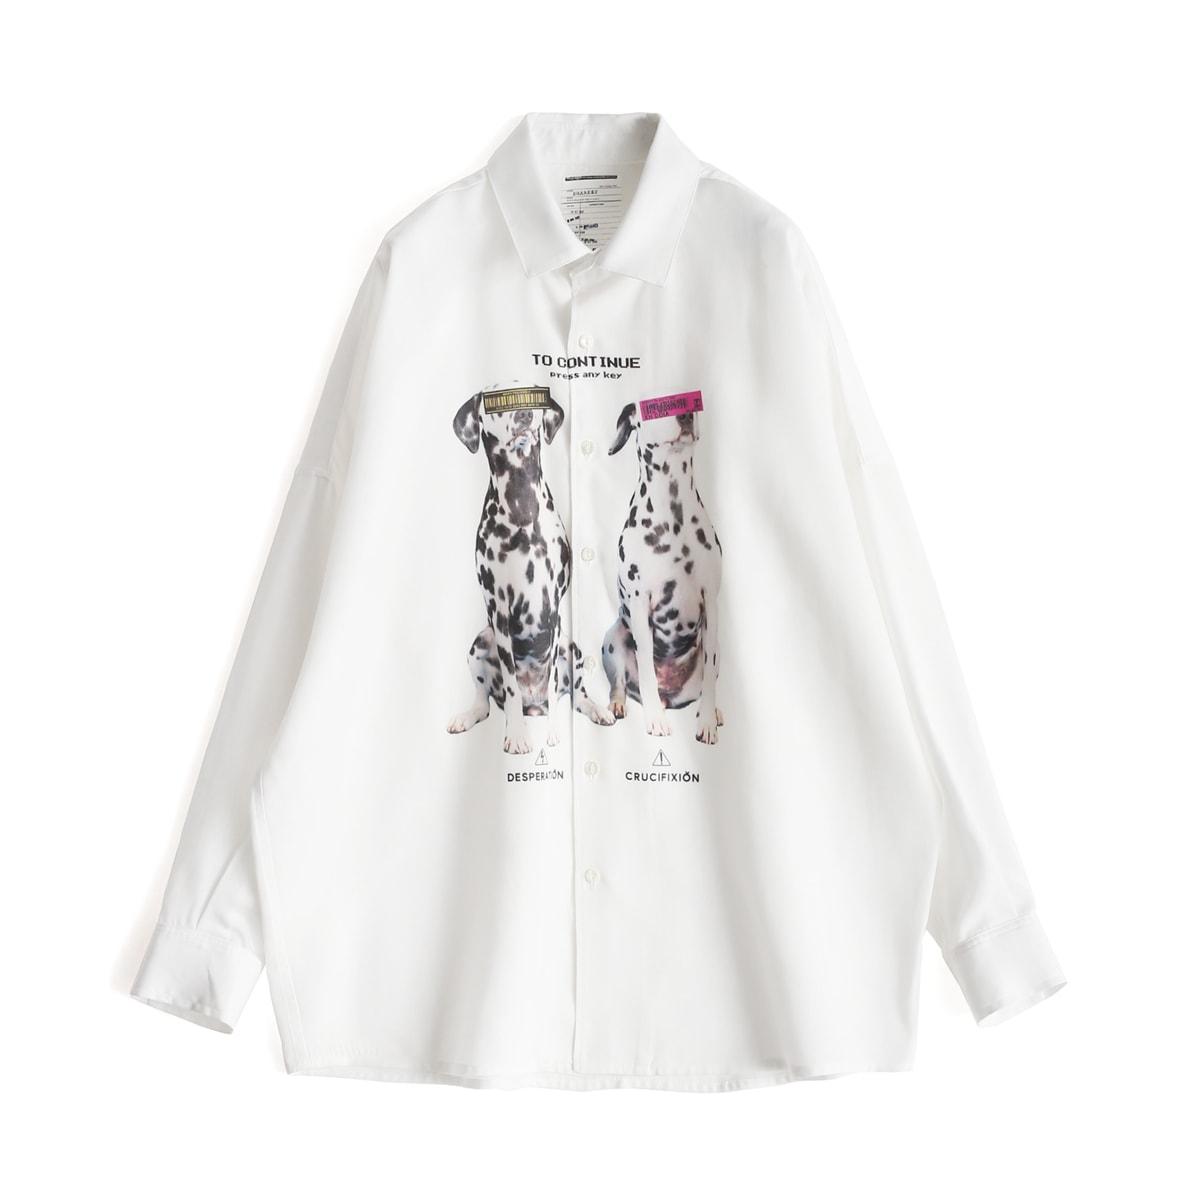 "SHAREEF ""DALMATIAN"" BIG SHIRTS (3色 White/Black/Navy) 20313020 シャリーフ ダルメシアン 犬 ビッグシャツ シャツ ビッグシルエット 日本製 メンズ 送料無料"